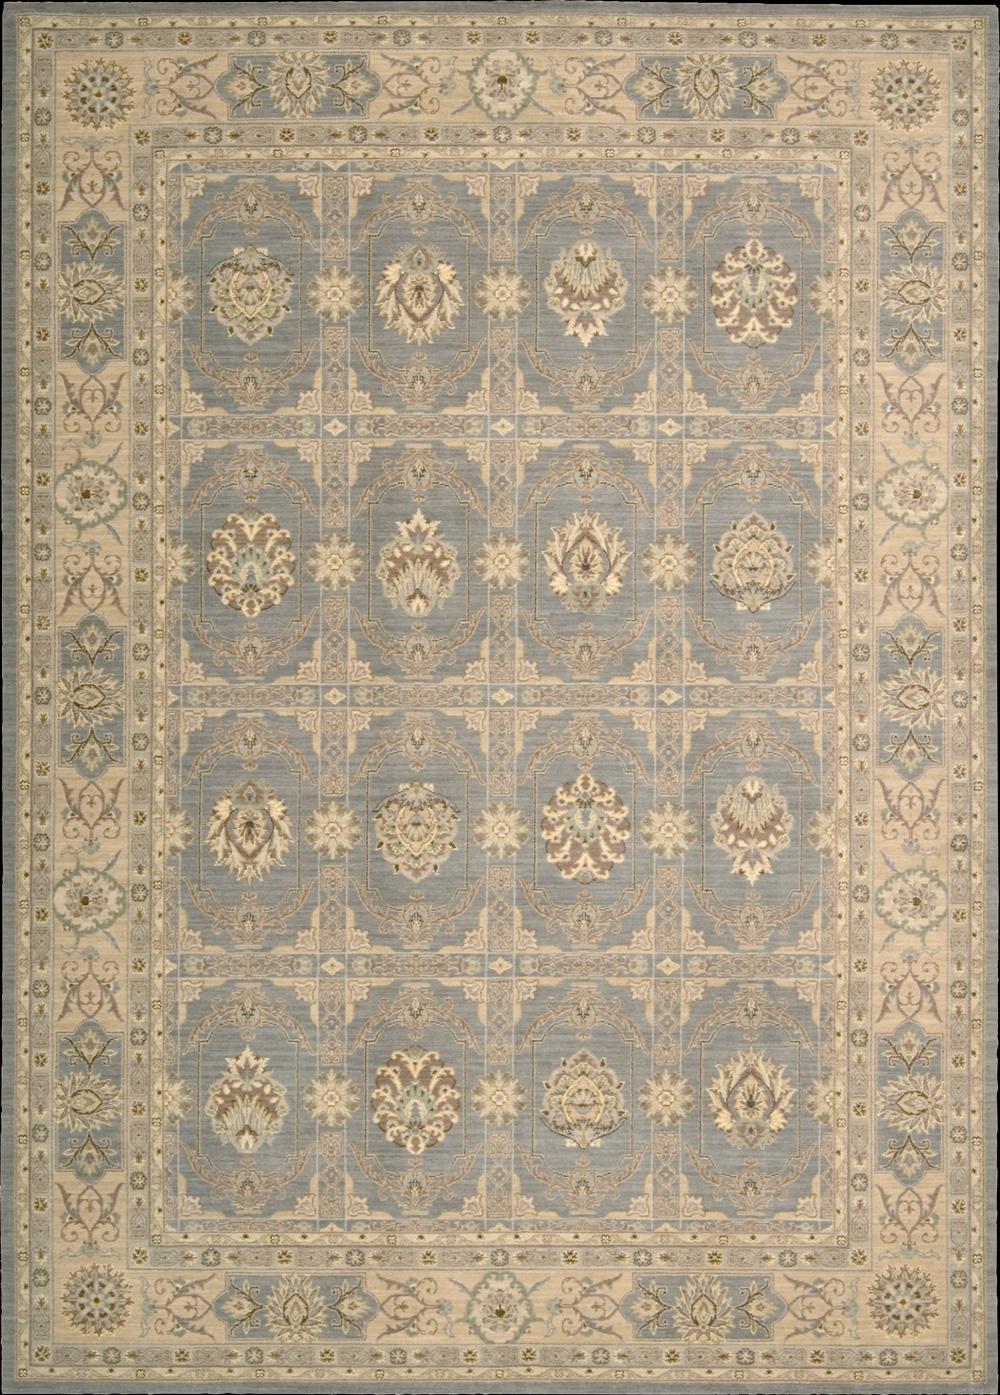 Nourison Persian Empire Area Rug 12' x 15' - Item Number: 25806